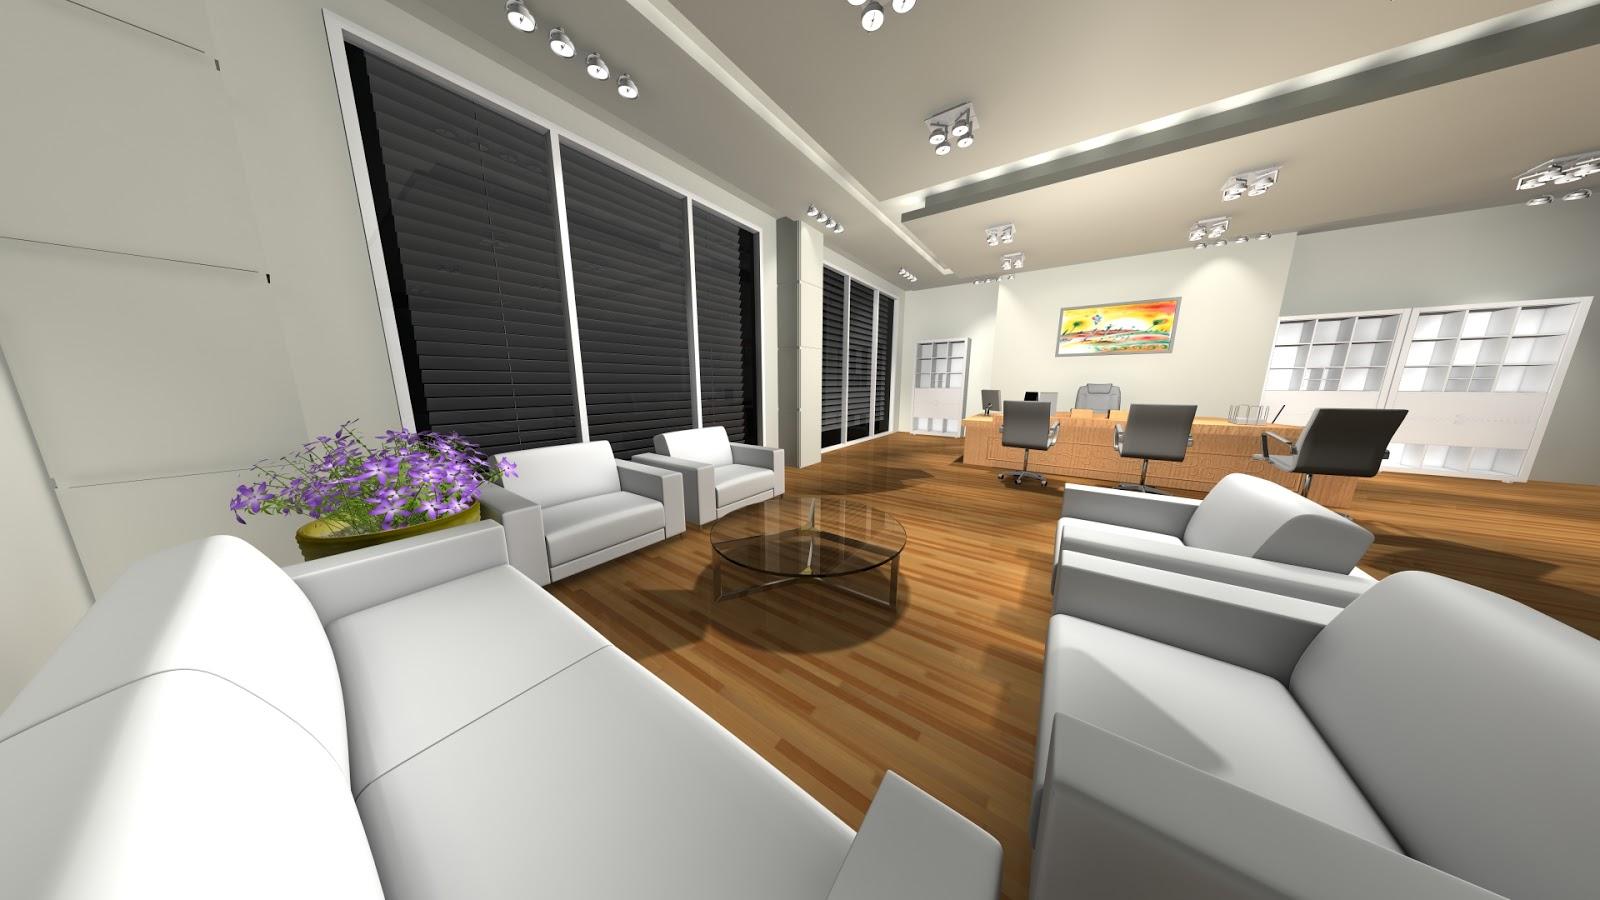 Sajid Designer Office Room 3d Interior Design 3ds Max